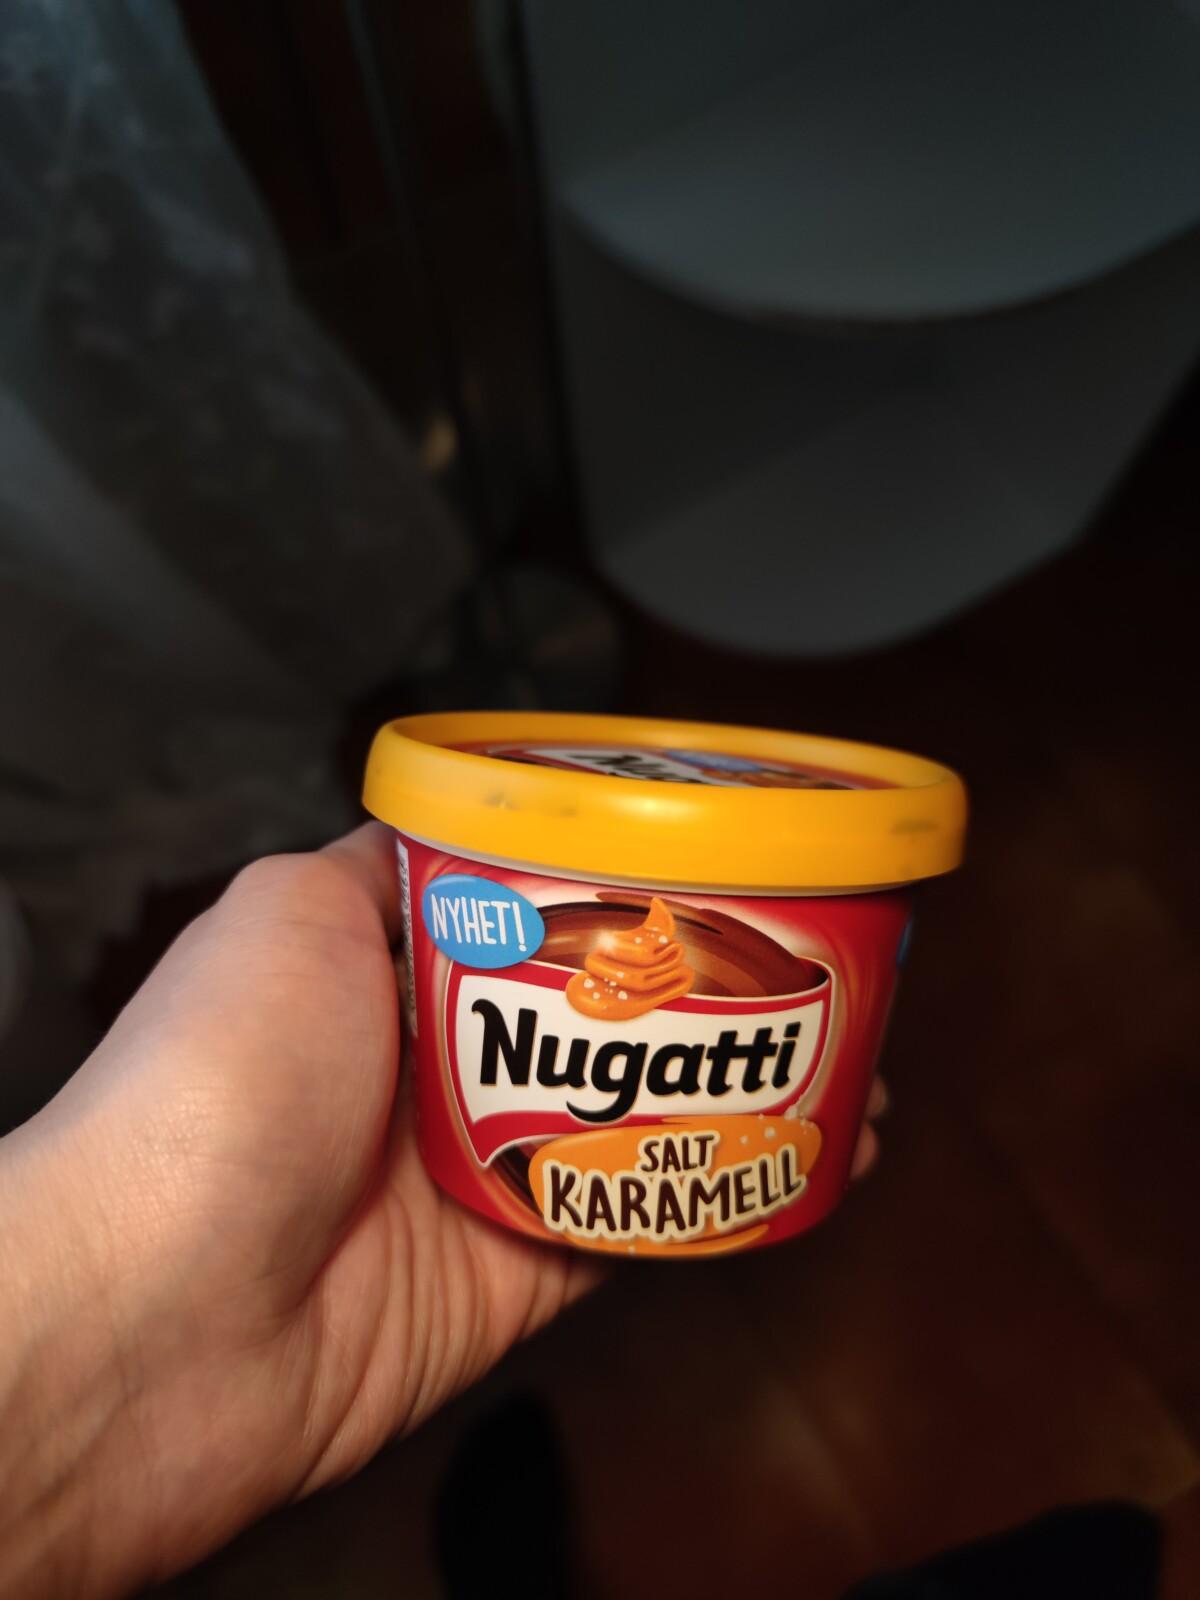 bringebærterte-bringebærtærte-pai-douez-isalicious-isalicious1-ukensomvar-pastaallimone-pasta-oppskrift-middag-mat-ukensbilde-natur-nugattikaramell-pakker-nelly-bubbleroom-isalicious.blogg.no